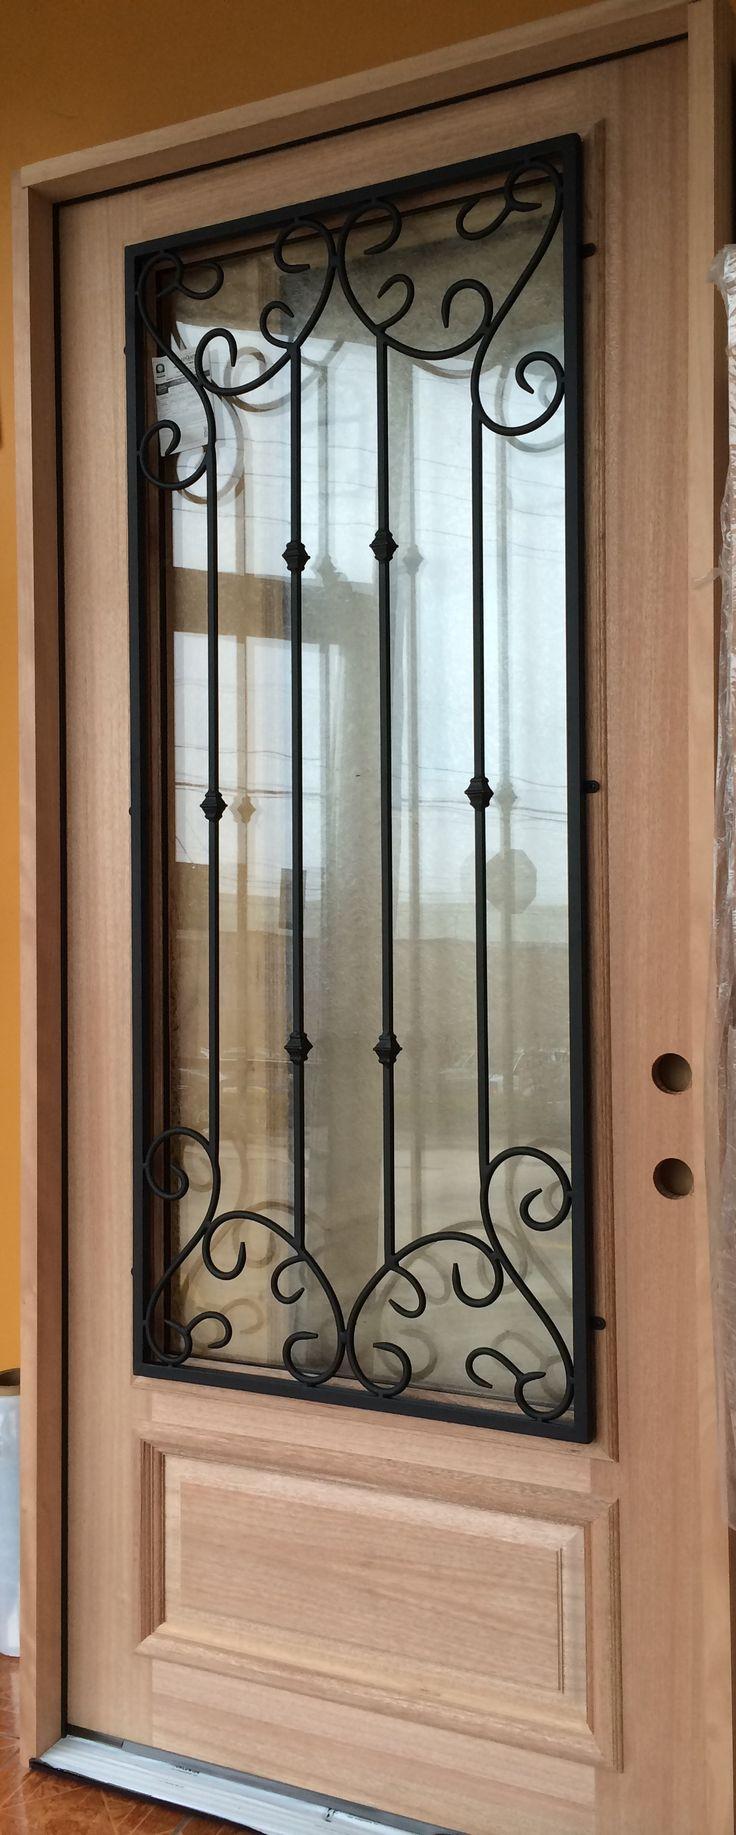 7 best iron grill mahogany wood doors images on pinterest iron grill wood door mahogany wood knotty alder doors for builders inc solid wood entry doors exterior wood doors front doors entry doors rubansaba